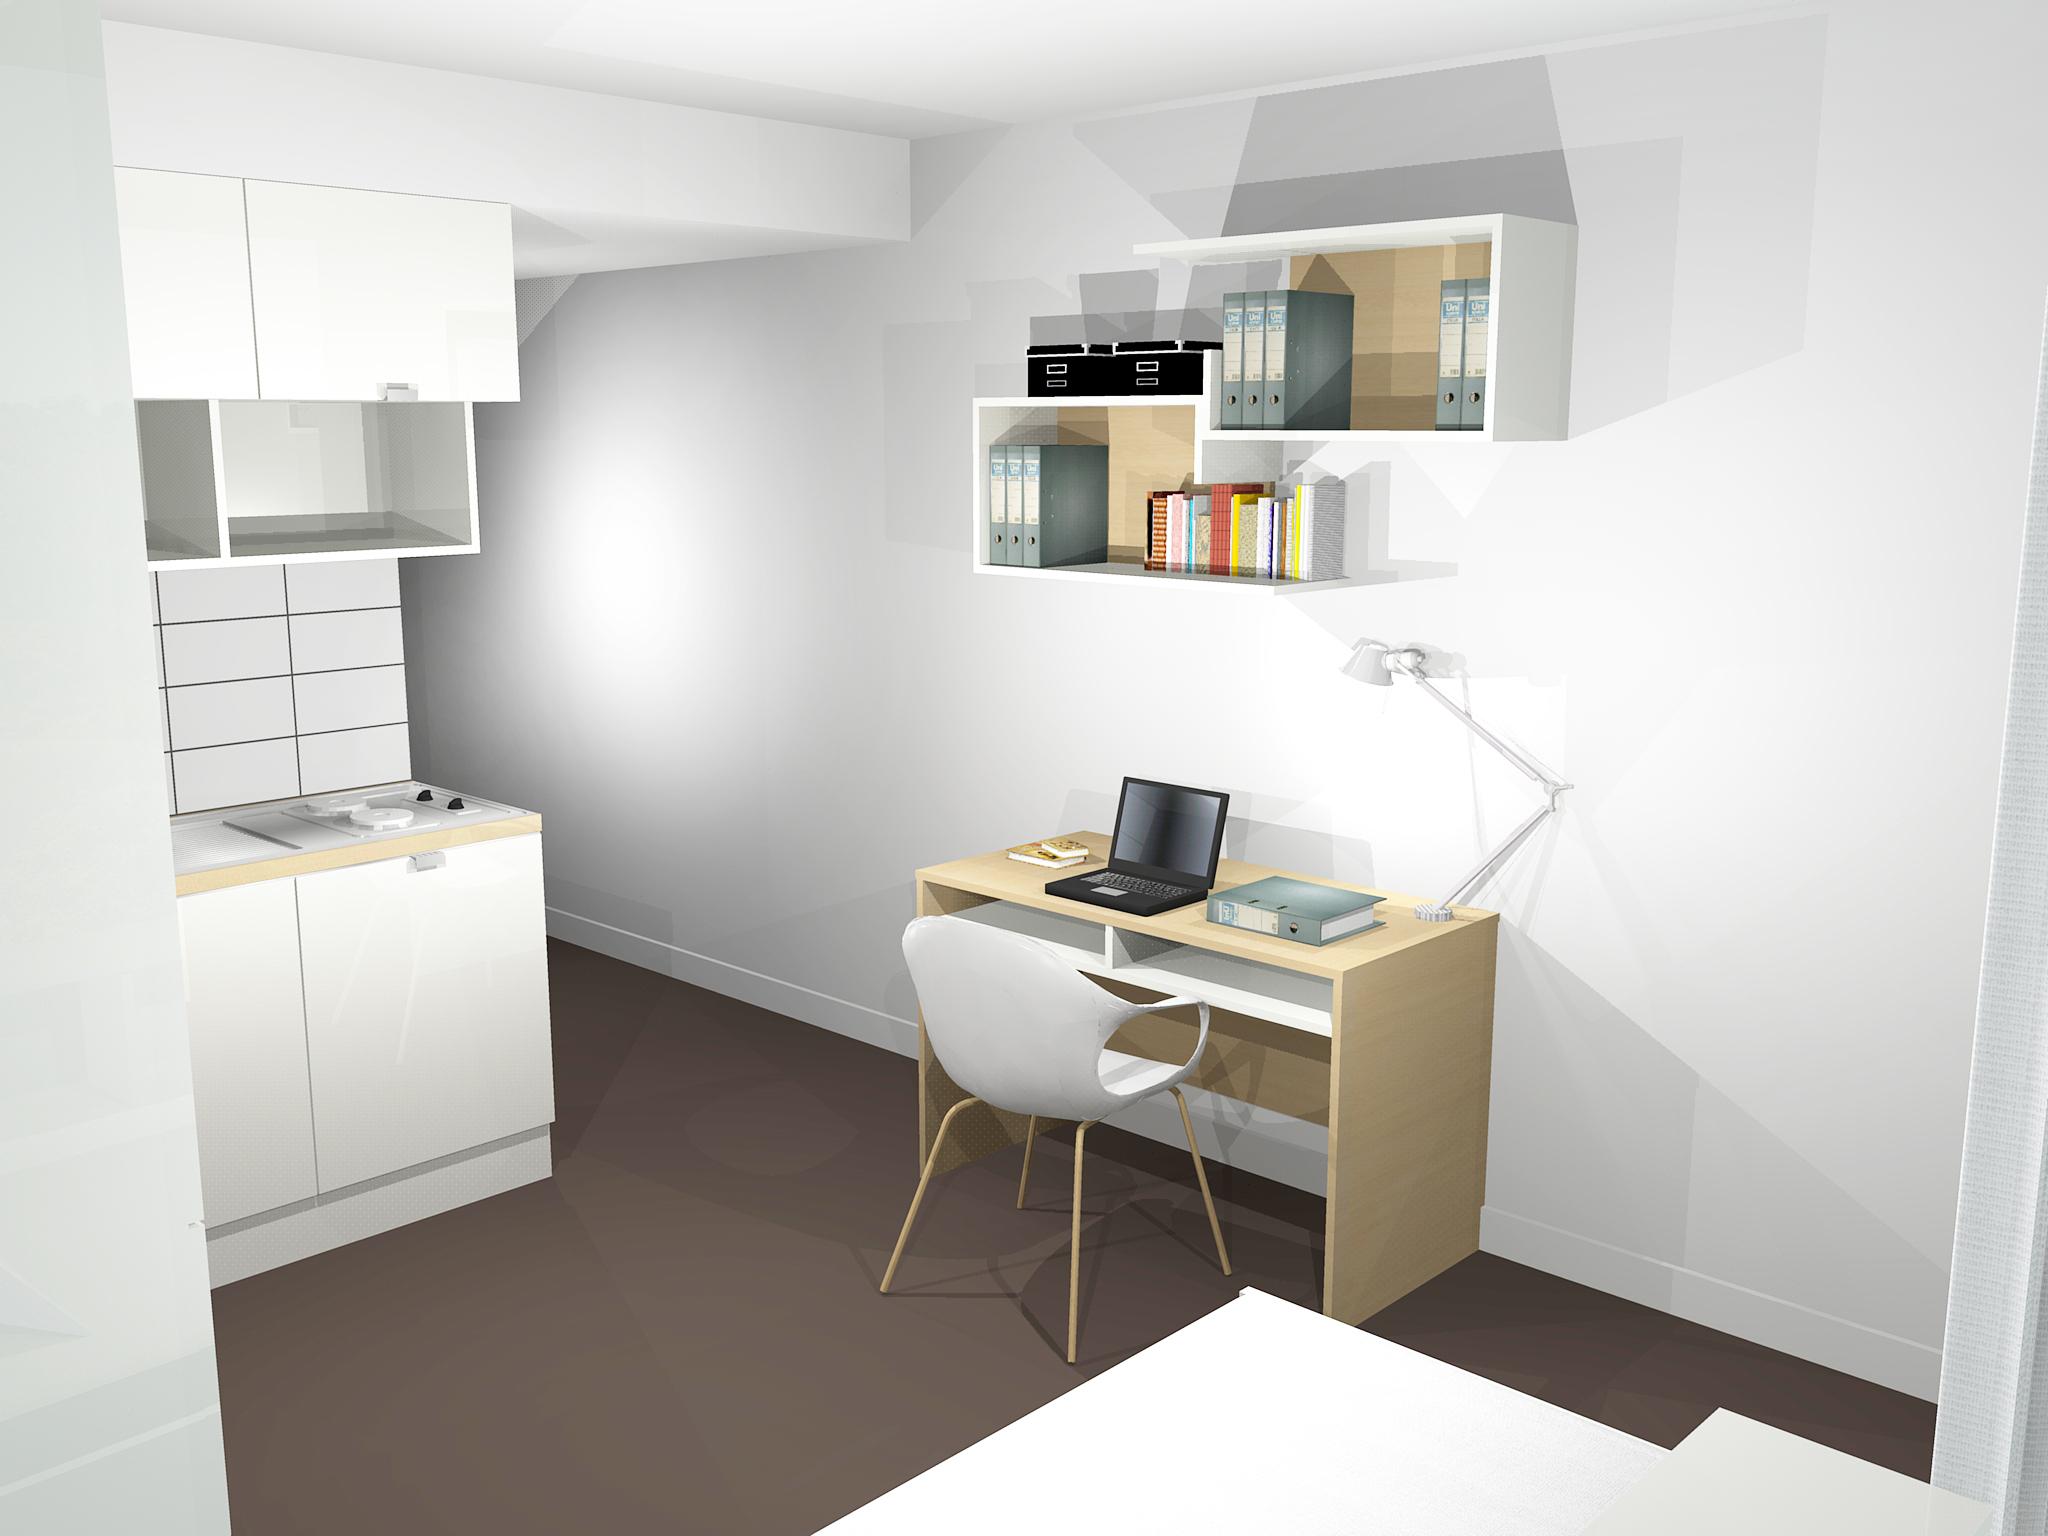 international university house amitel. Black Bedroom Furniture Sets. Home Design Ideas